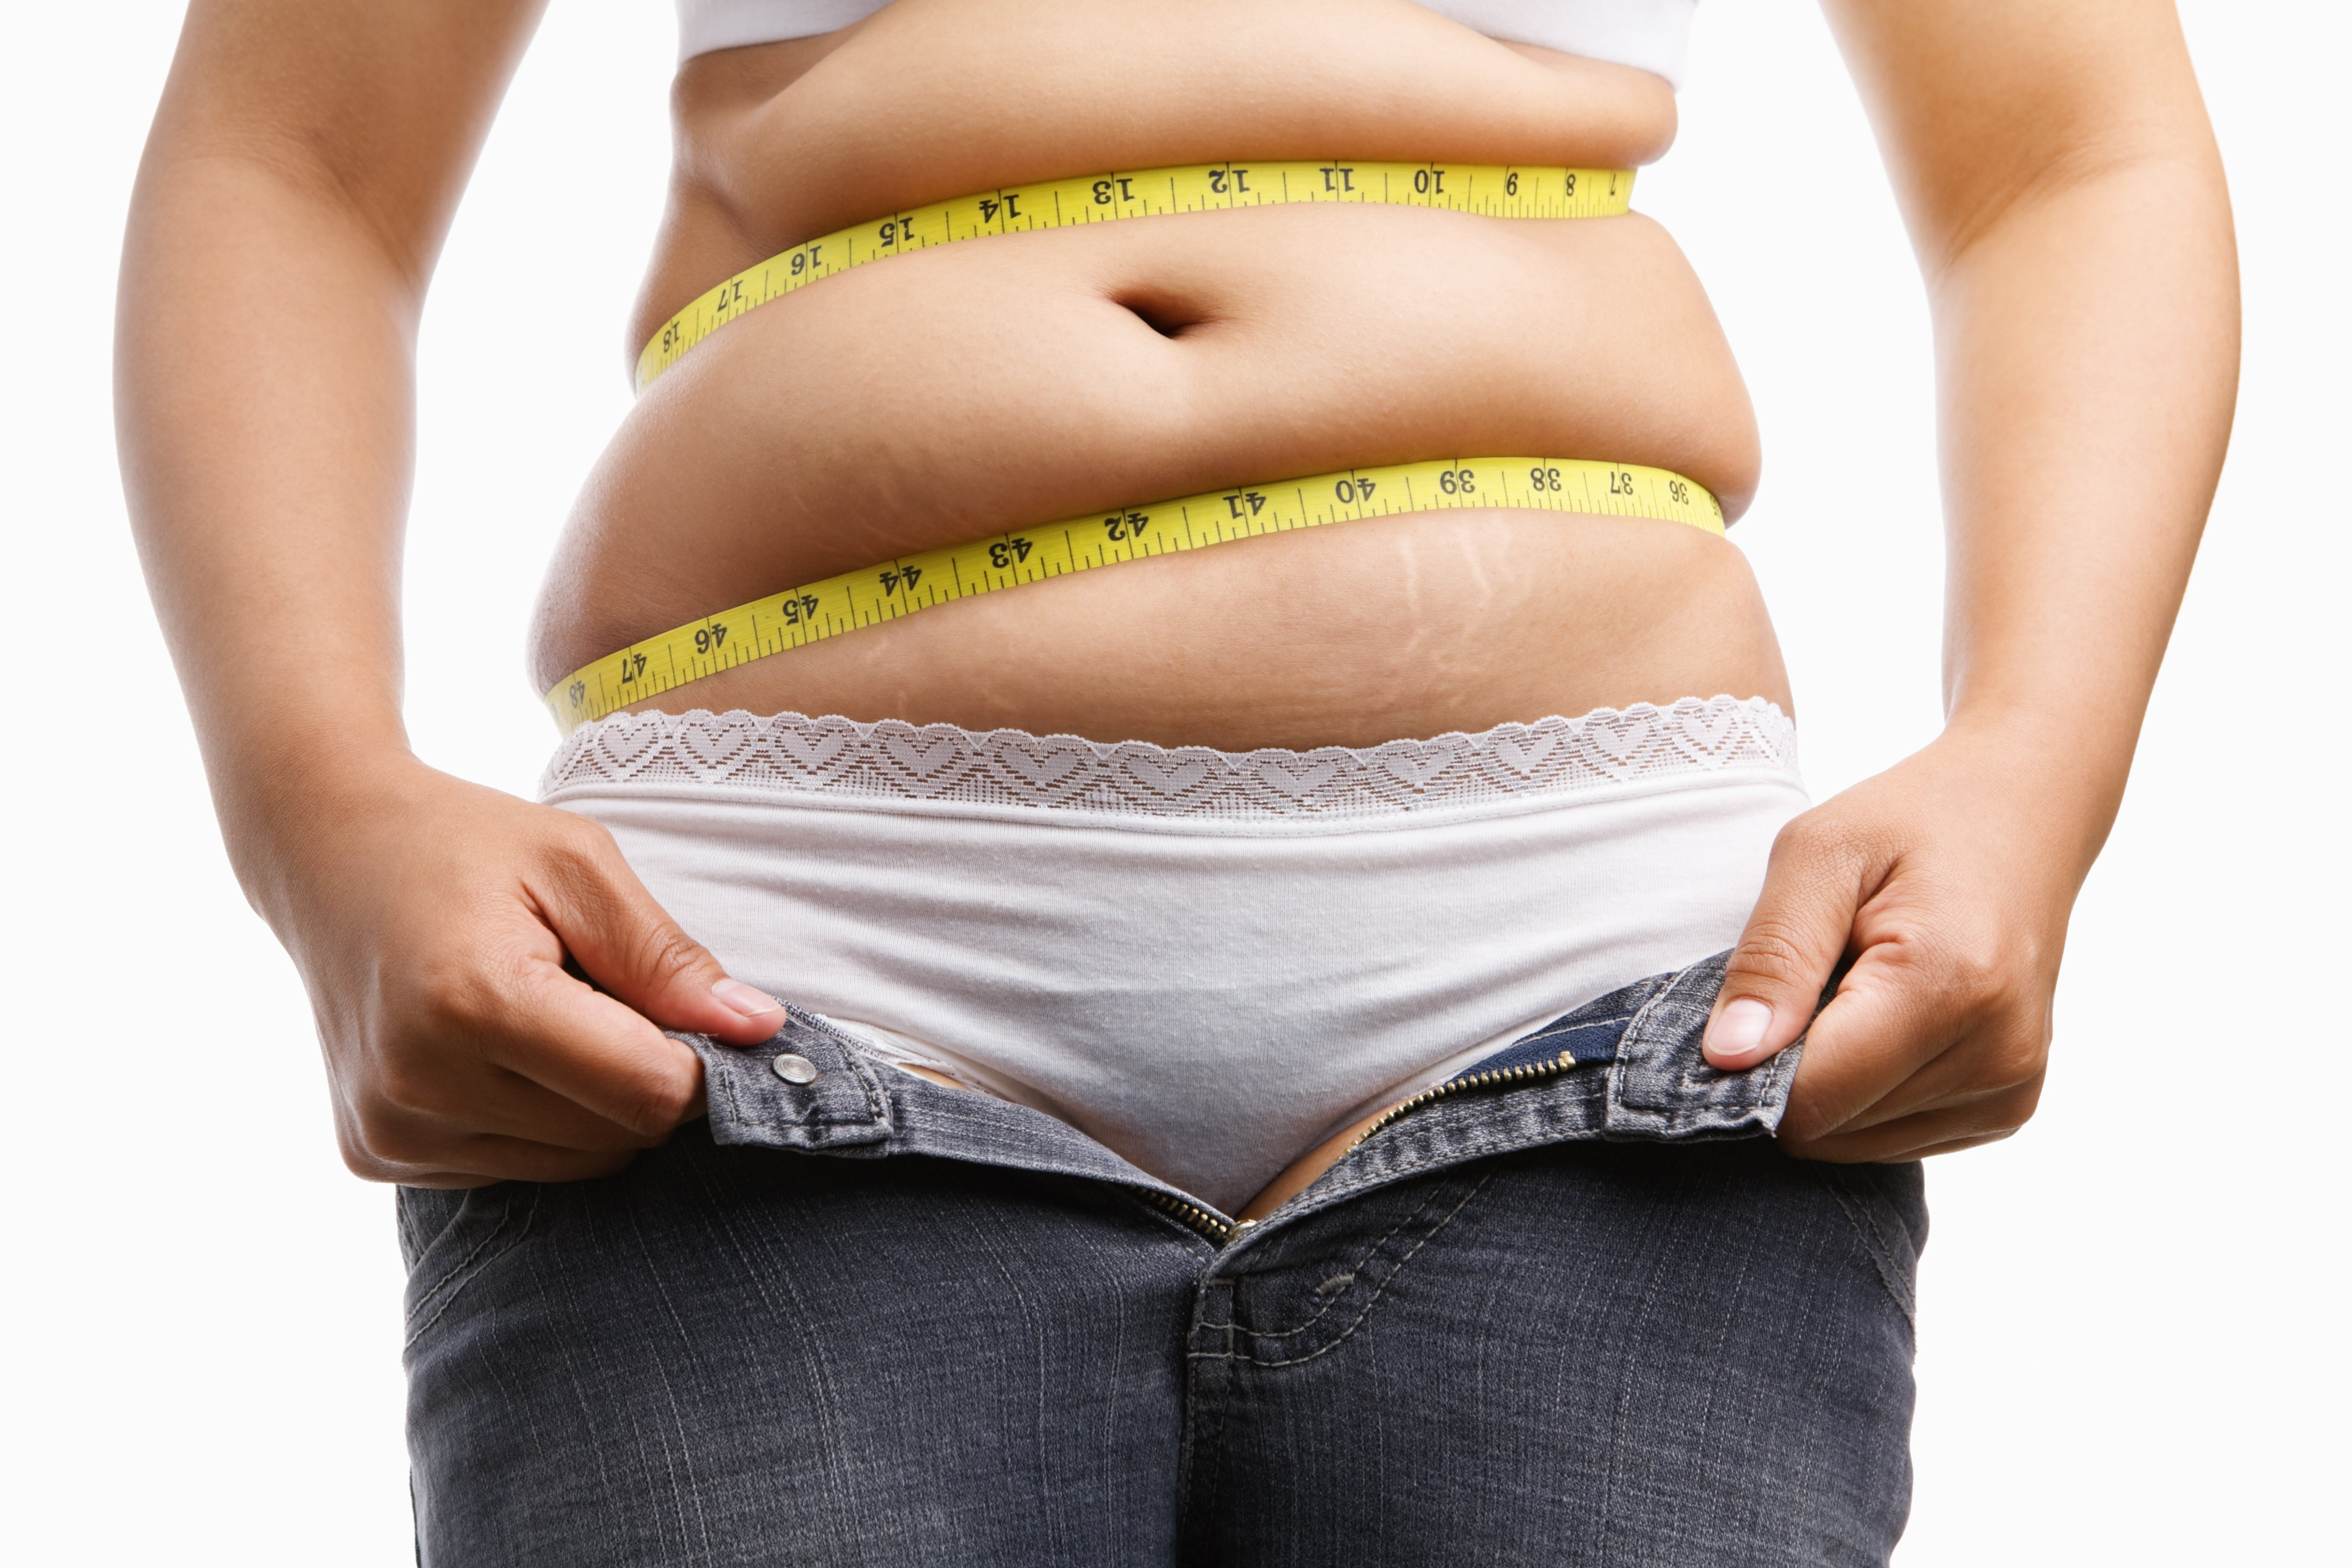 Best Weight Loss Doctor In Macon Ga